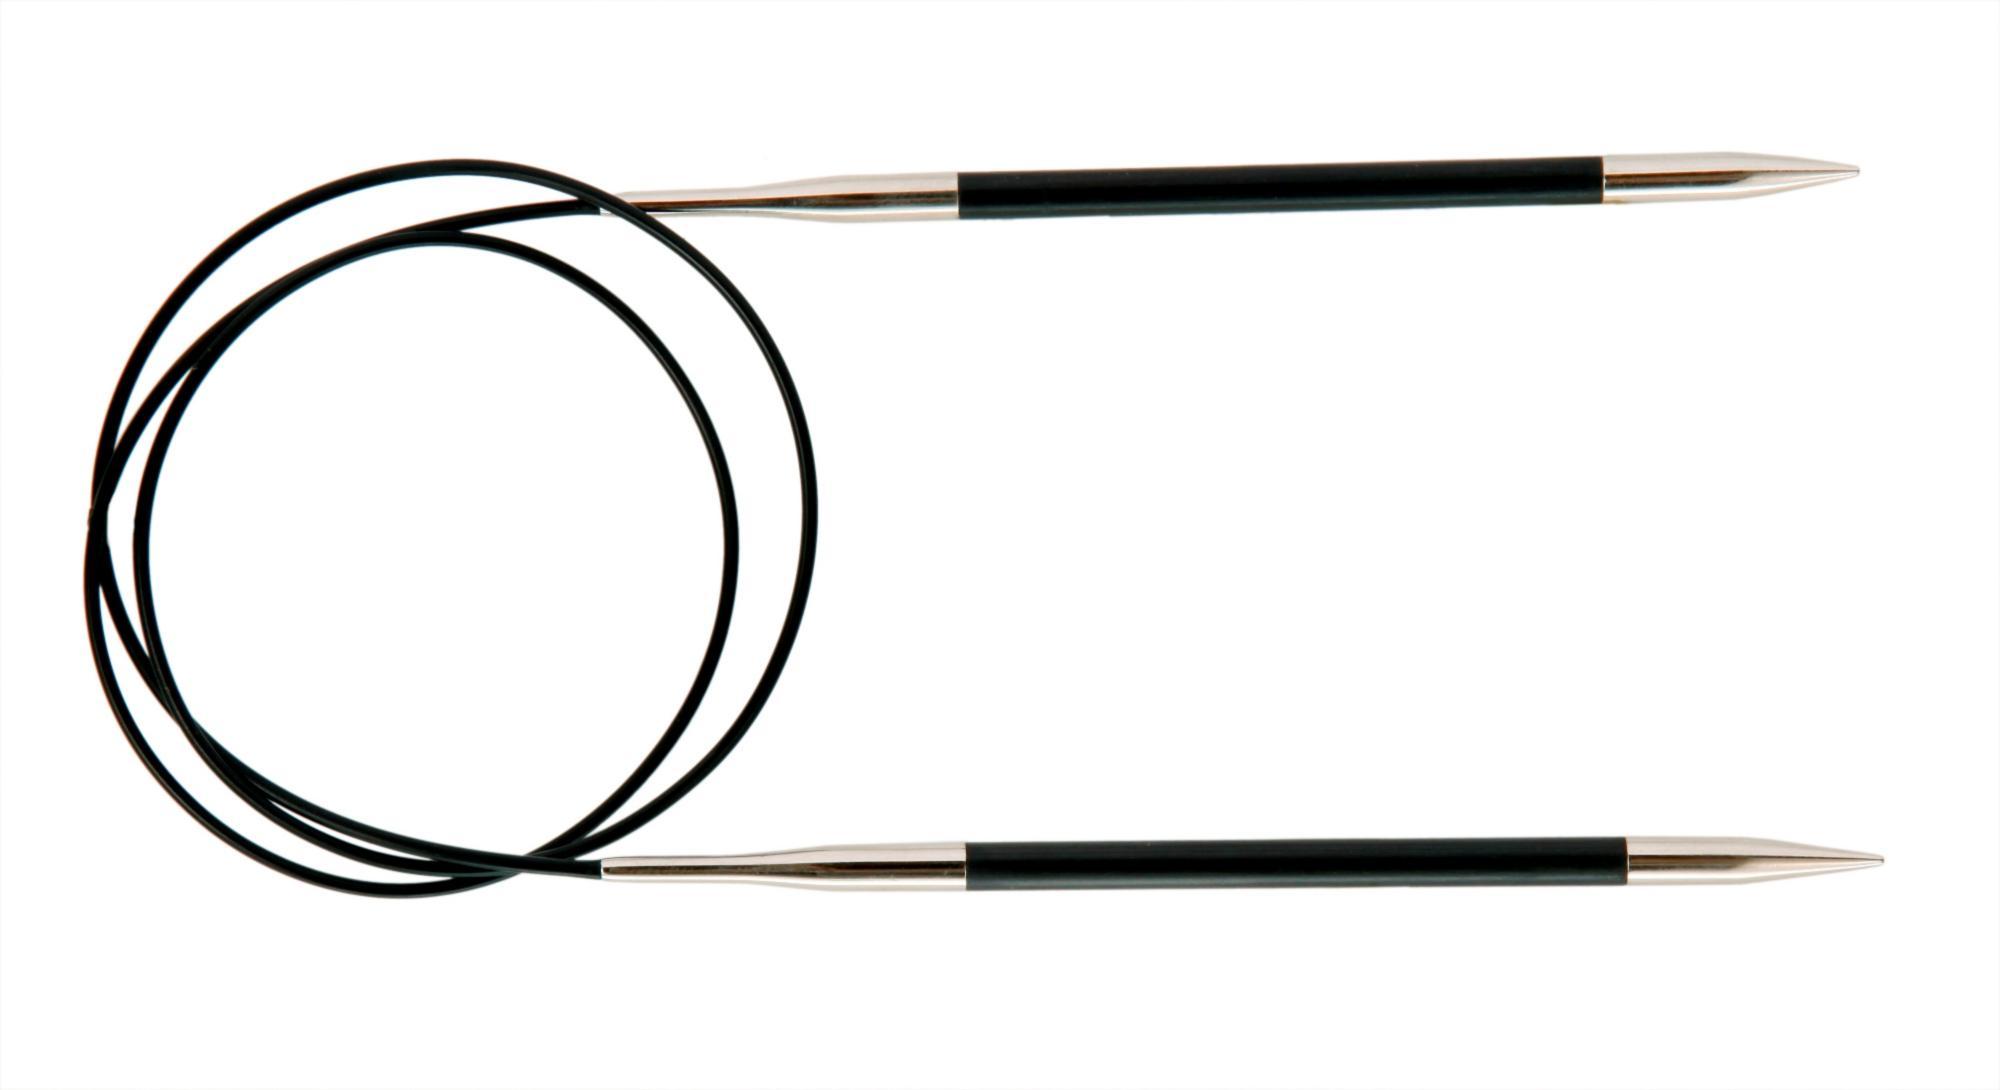 Спицы круговые 40 см Karbonz KnitPro, 41144, 3.00 мм